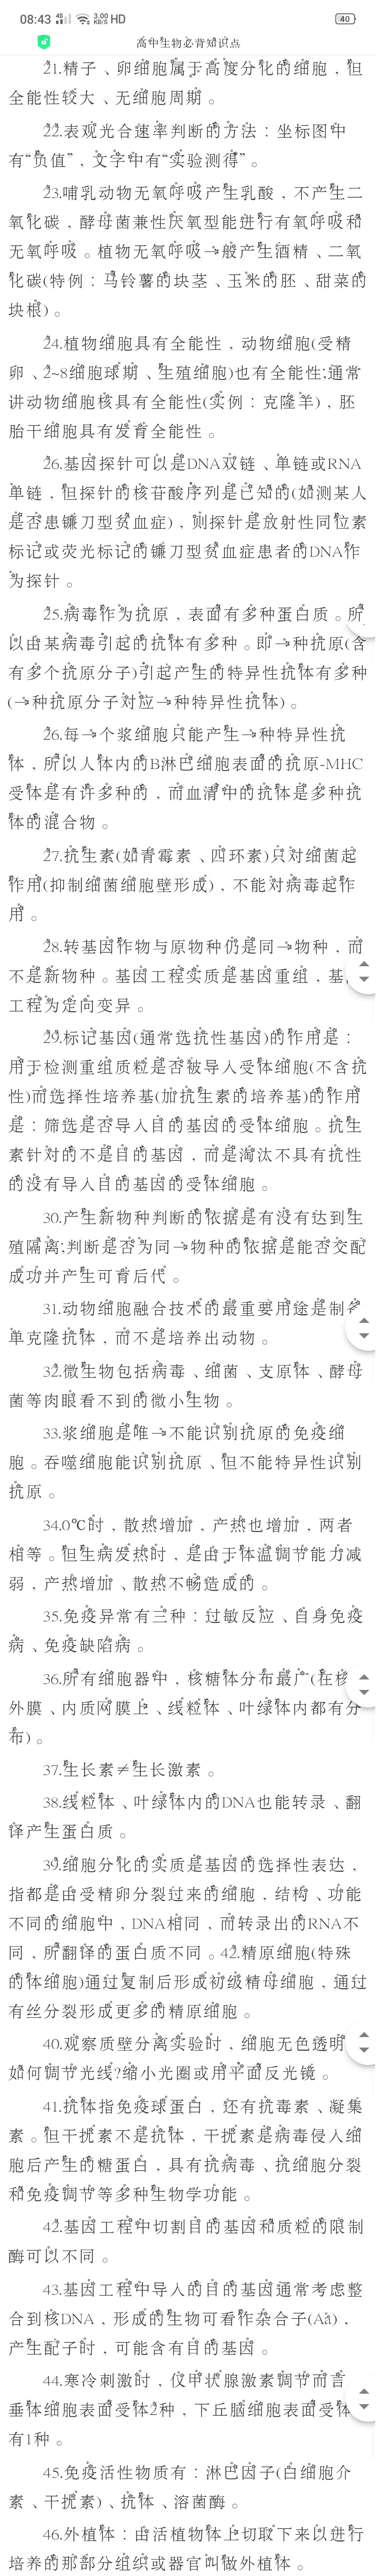 Screenshot_2019-07-26-08-43-41-11.png